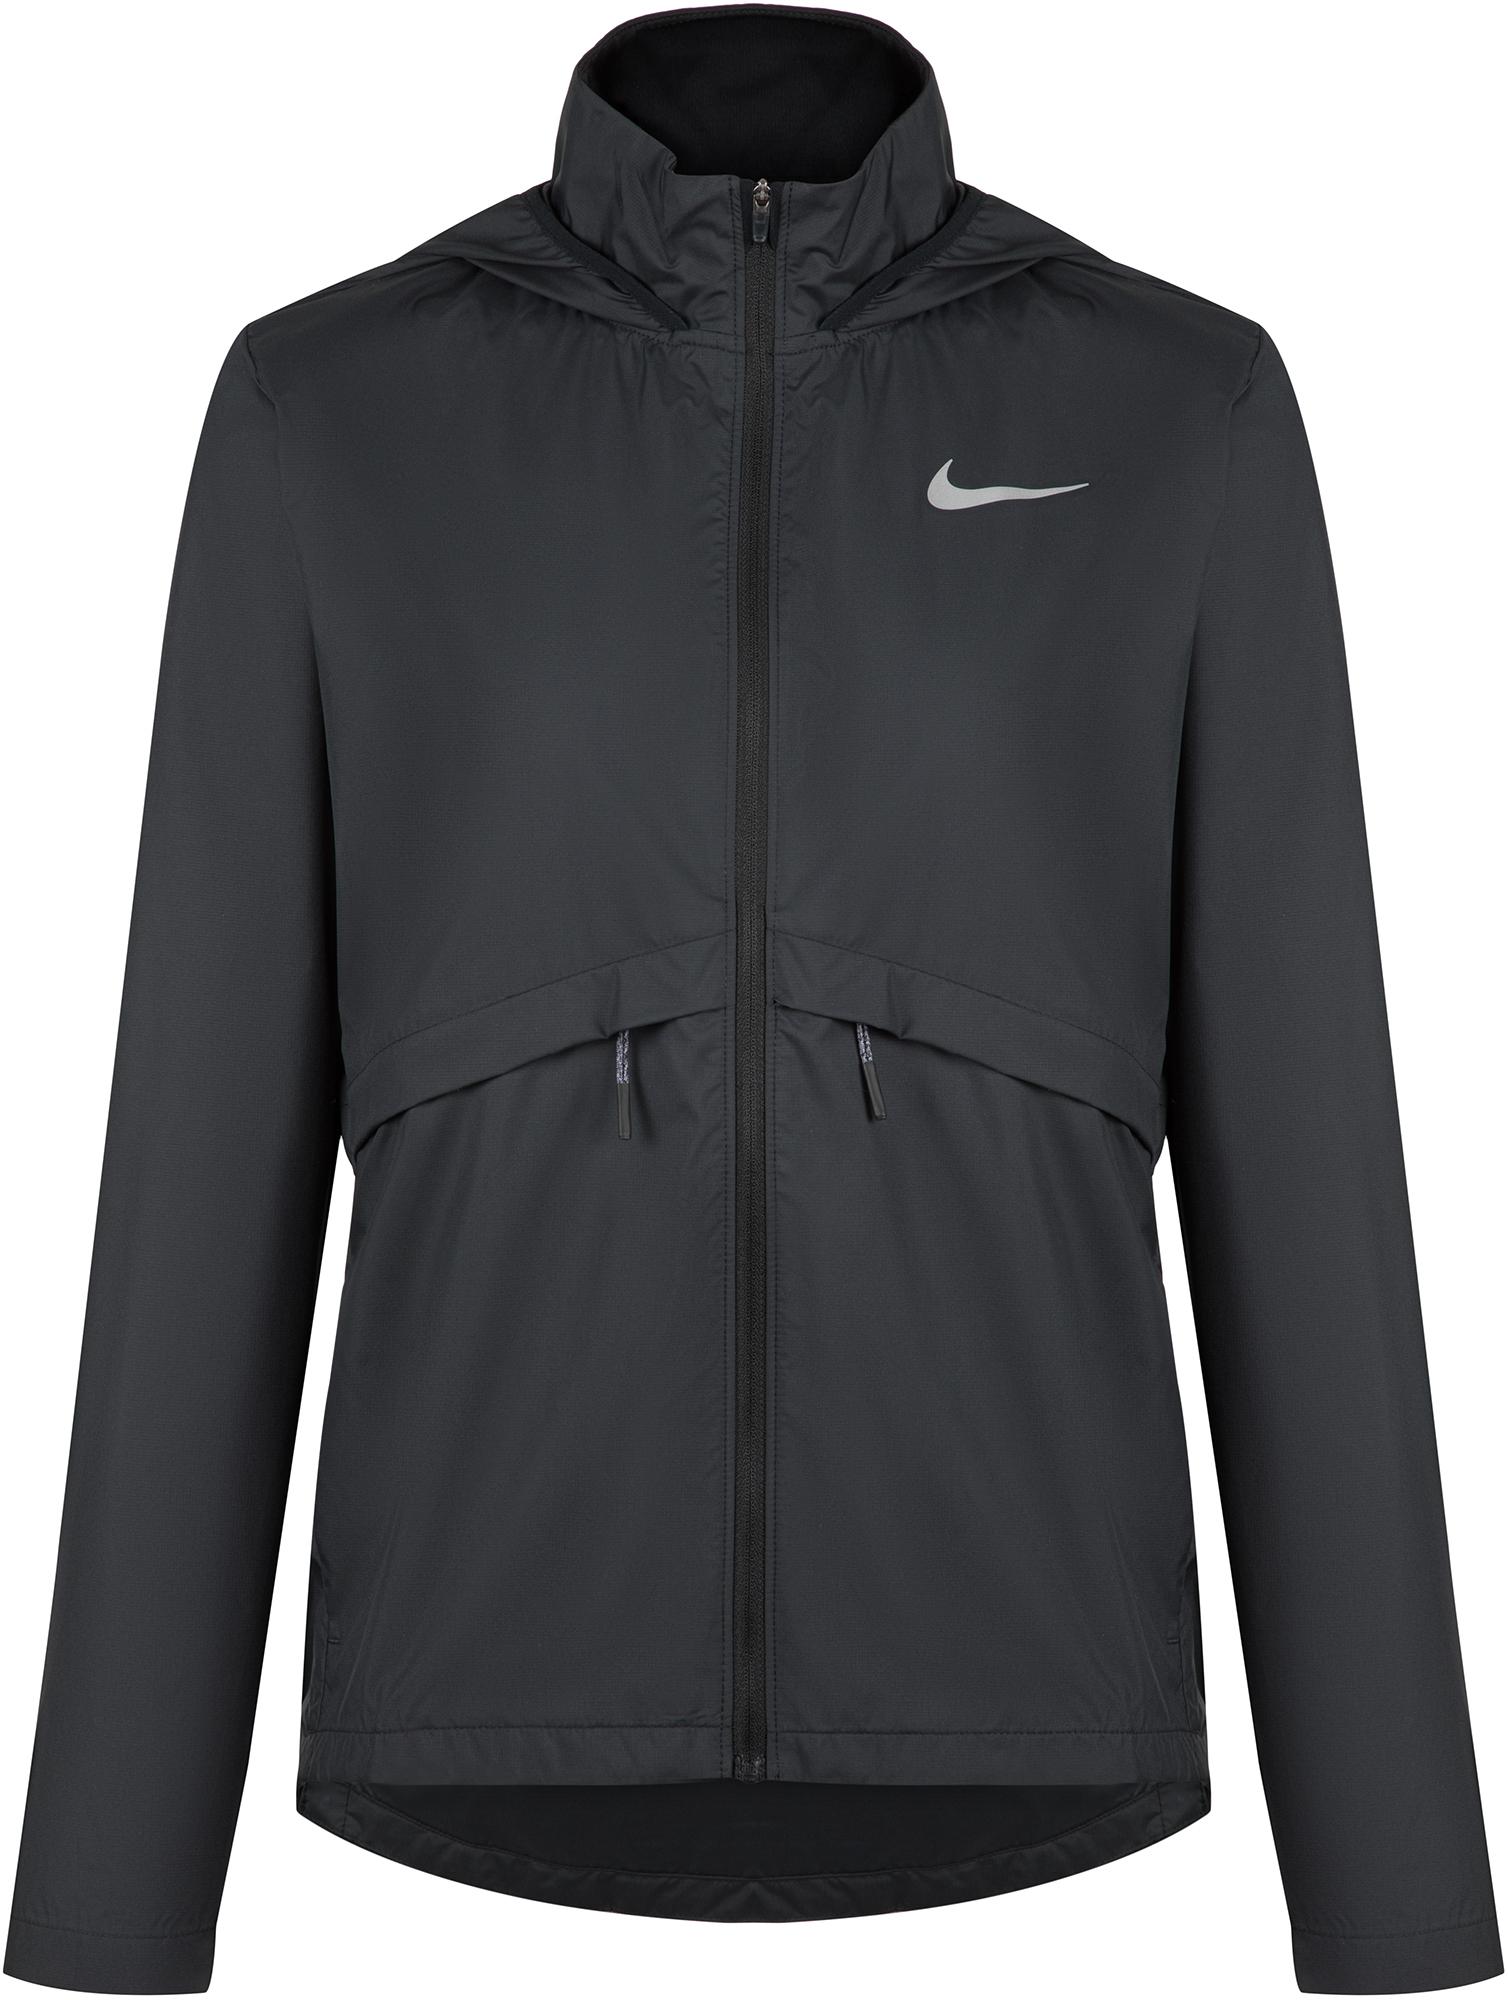 цена Nike Ветровка женская Nike, размер 48-50 онлайн в 2017 году